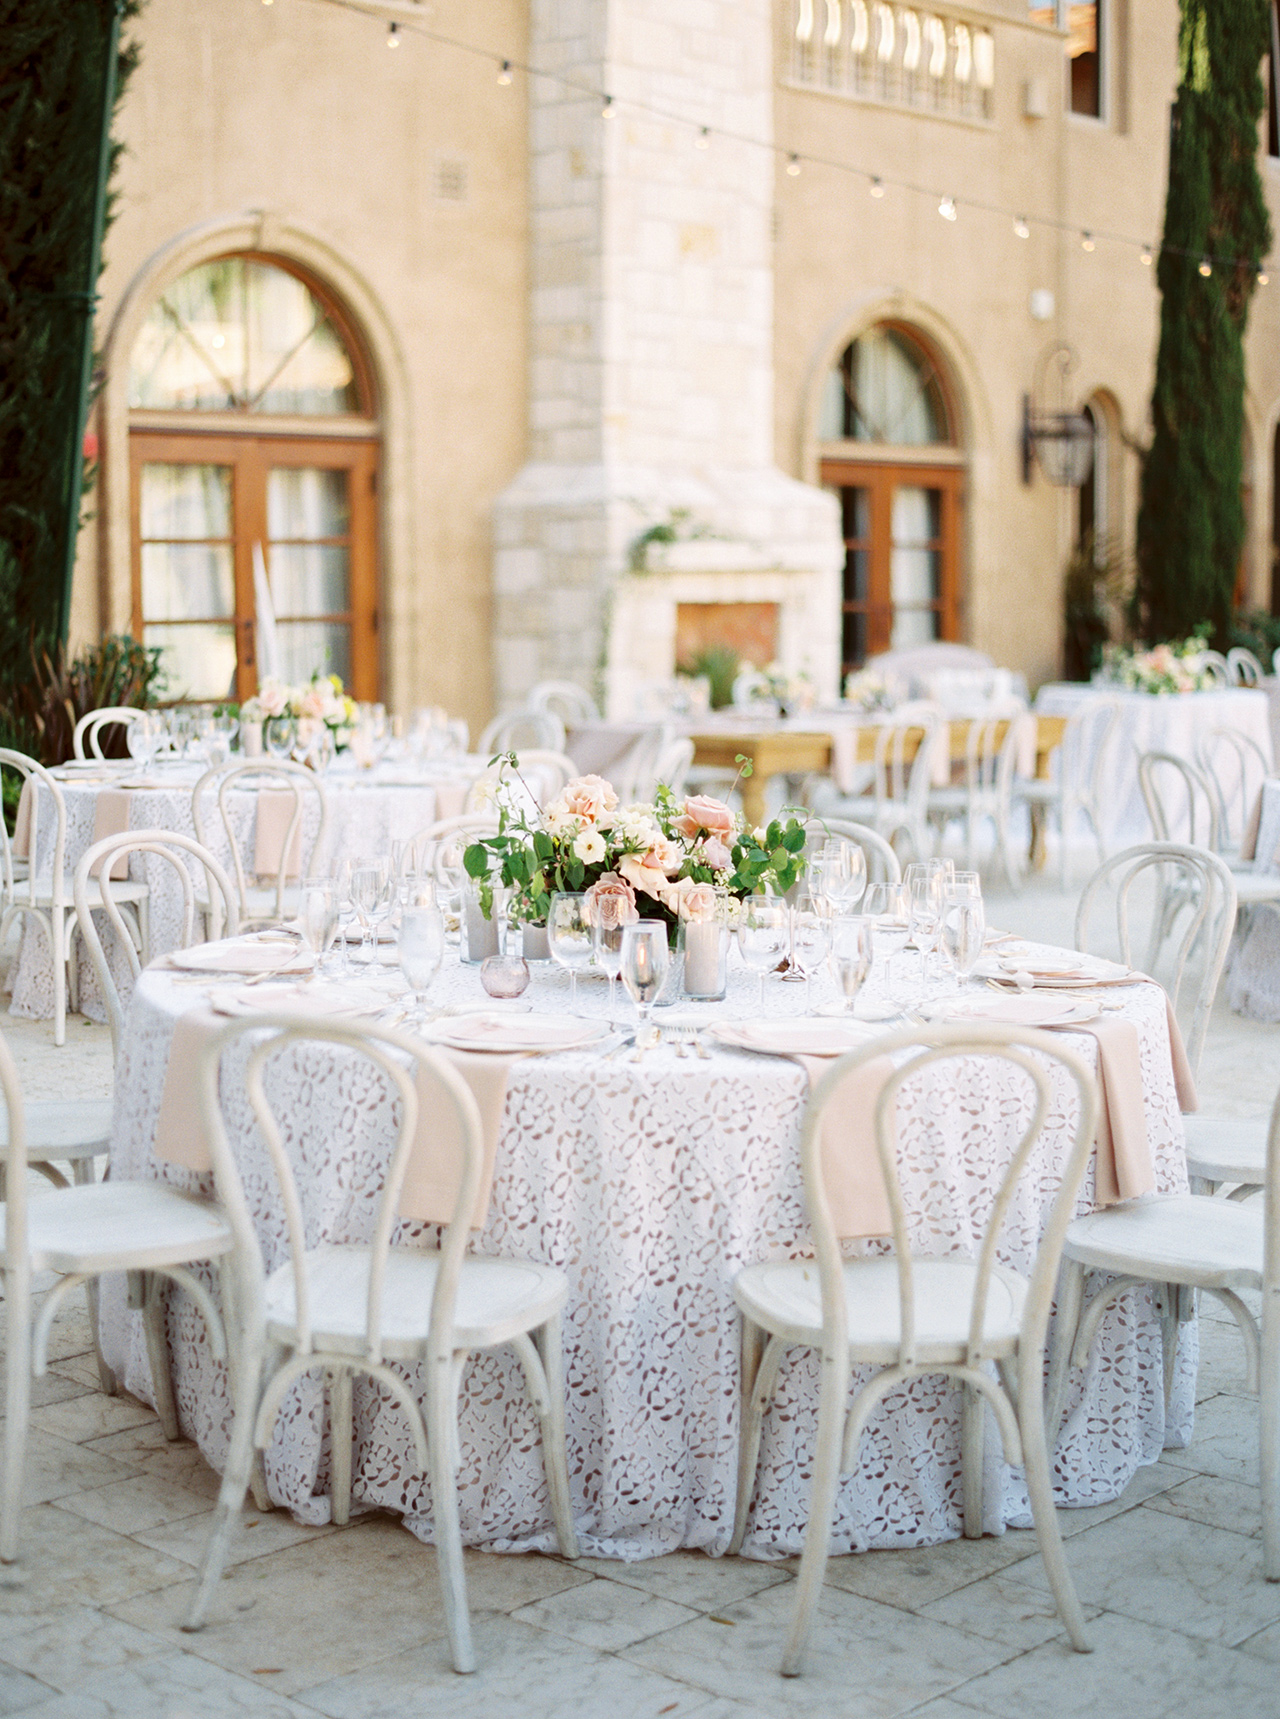 outdoors wedding reception resort courtyard tables